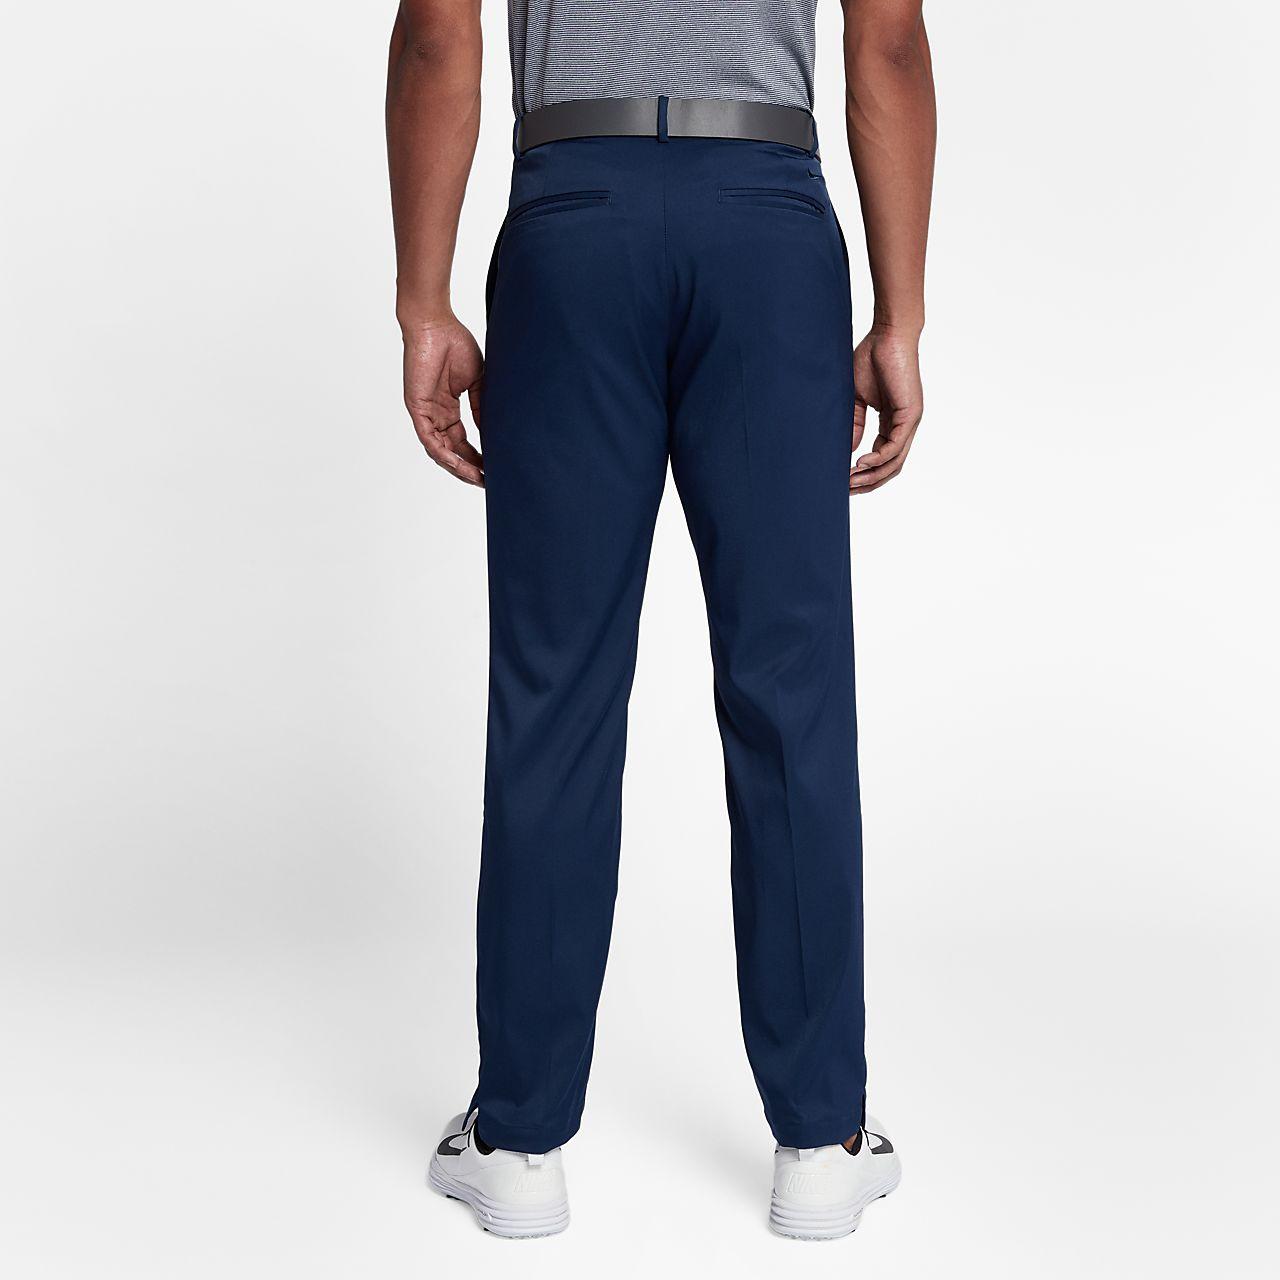 45546e577519 Nike Flat Front Men s Golf Trousers. Nike.com NO